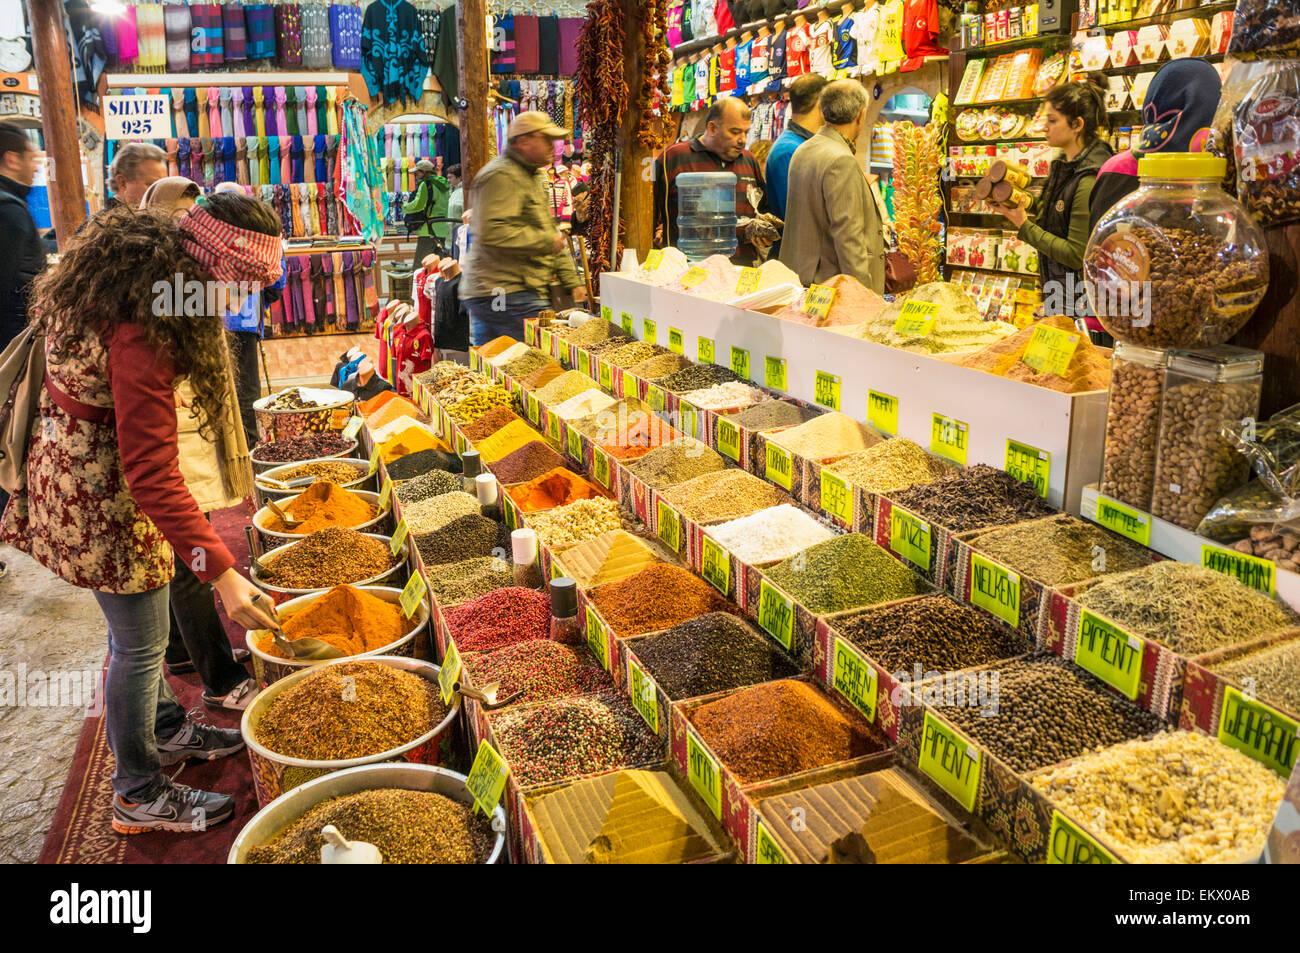 Shopping in the traditional spice market or Bazaar, Antalya old town, Antalya, Mediterranean Region, Turkey - Stock Image